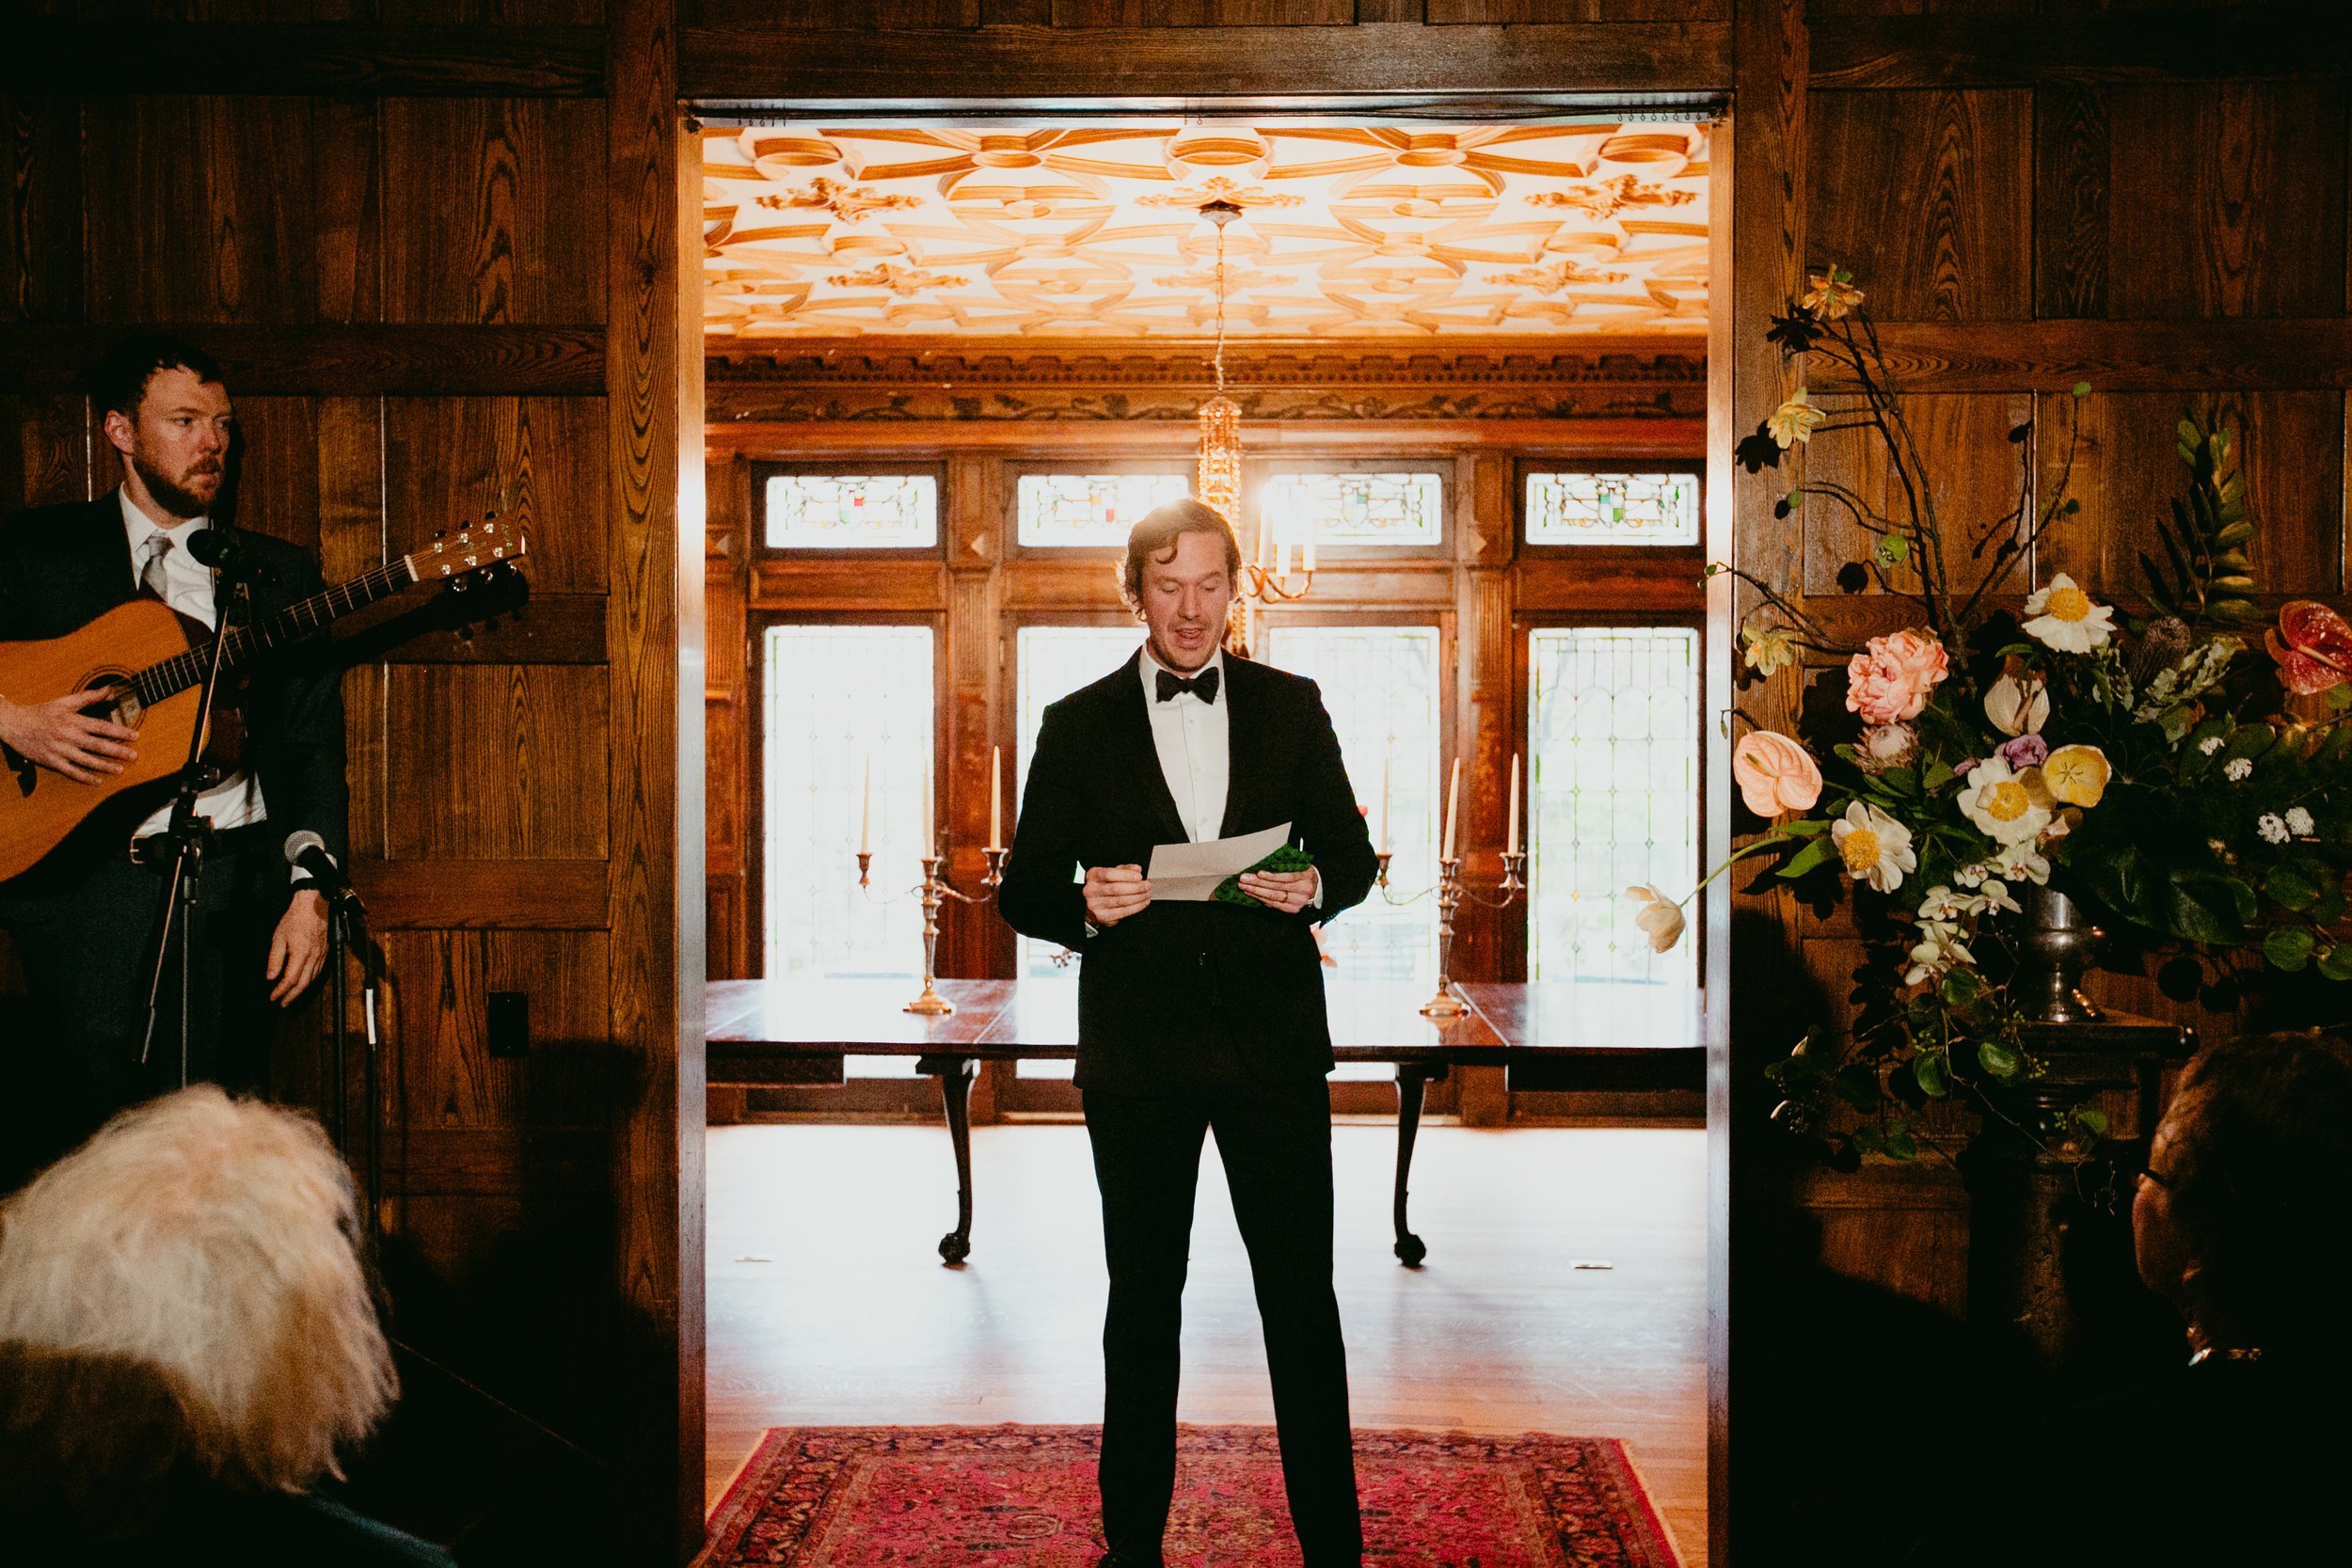 Tiger_House_The_Inn_at_Hudson-Wedding_Chellise_Michael_Photography-206.jpg